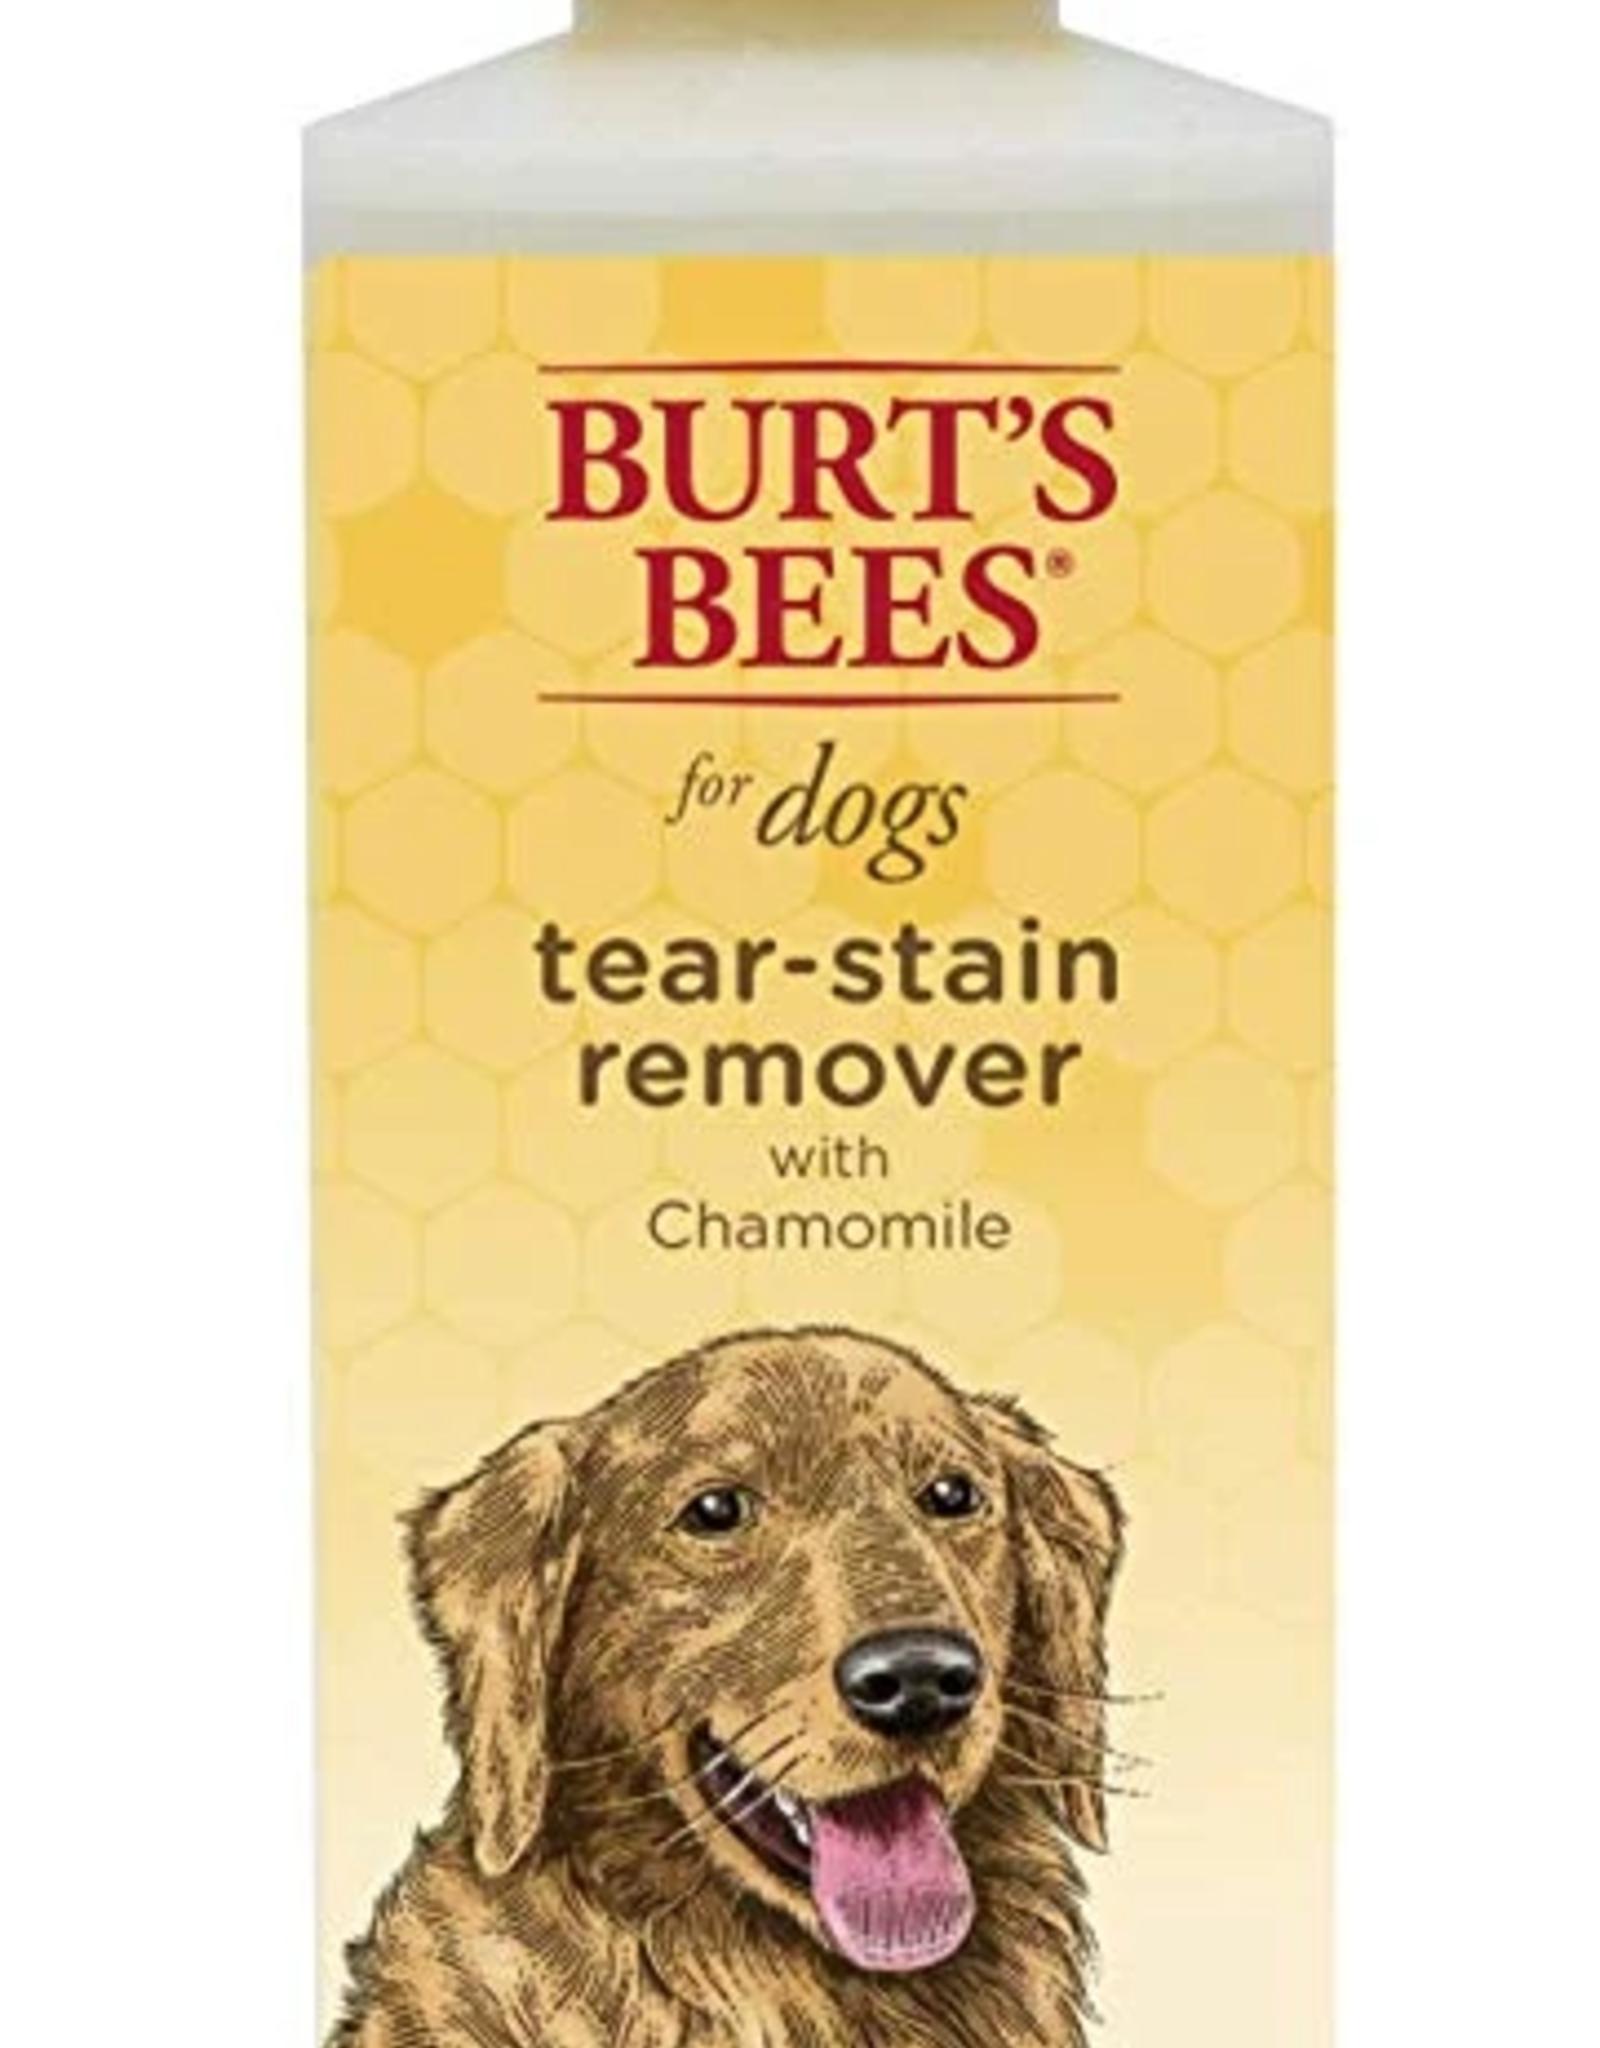 Burt's Bees Burt's Bees Tear Stain Remover 4oz